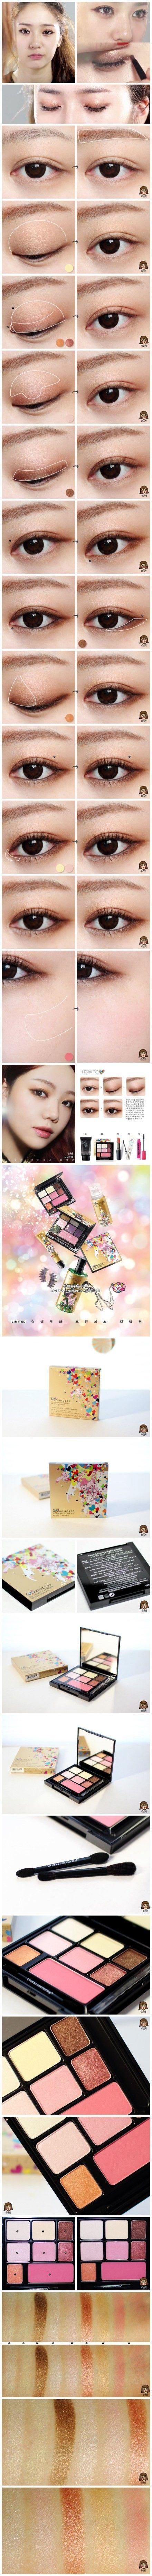 Korean make up, Krystal's eye makeup tutorial #JoinNerium #DebbieKrug #NeriumKorea www.AsianSkincare.Rocks